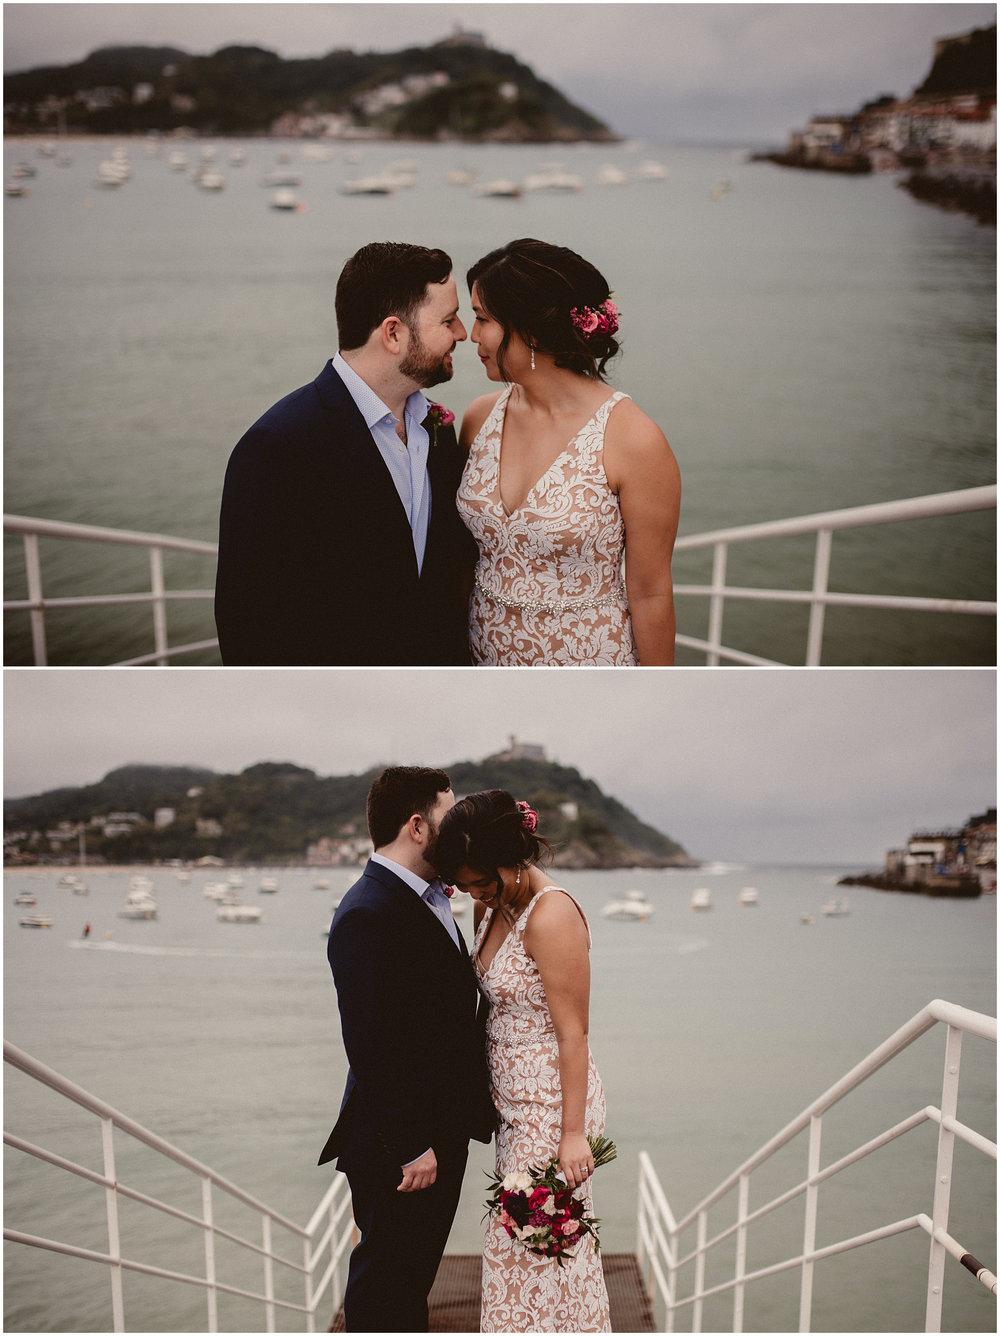 Brian & Julia - Destination wedding in San Sebastián  - Elopement in San Sebastian- ARTEFOTO61.jpg